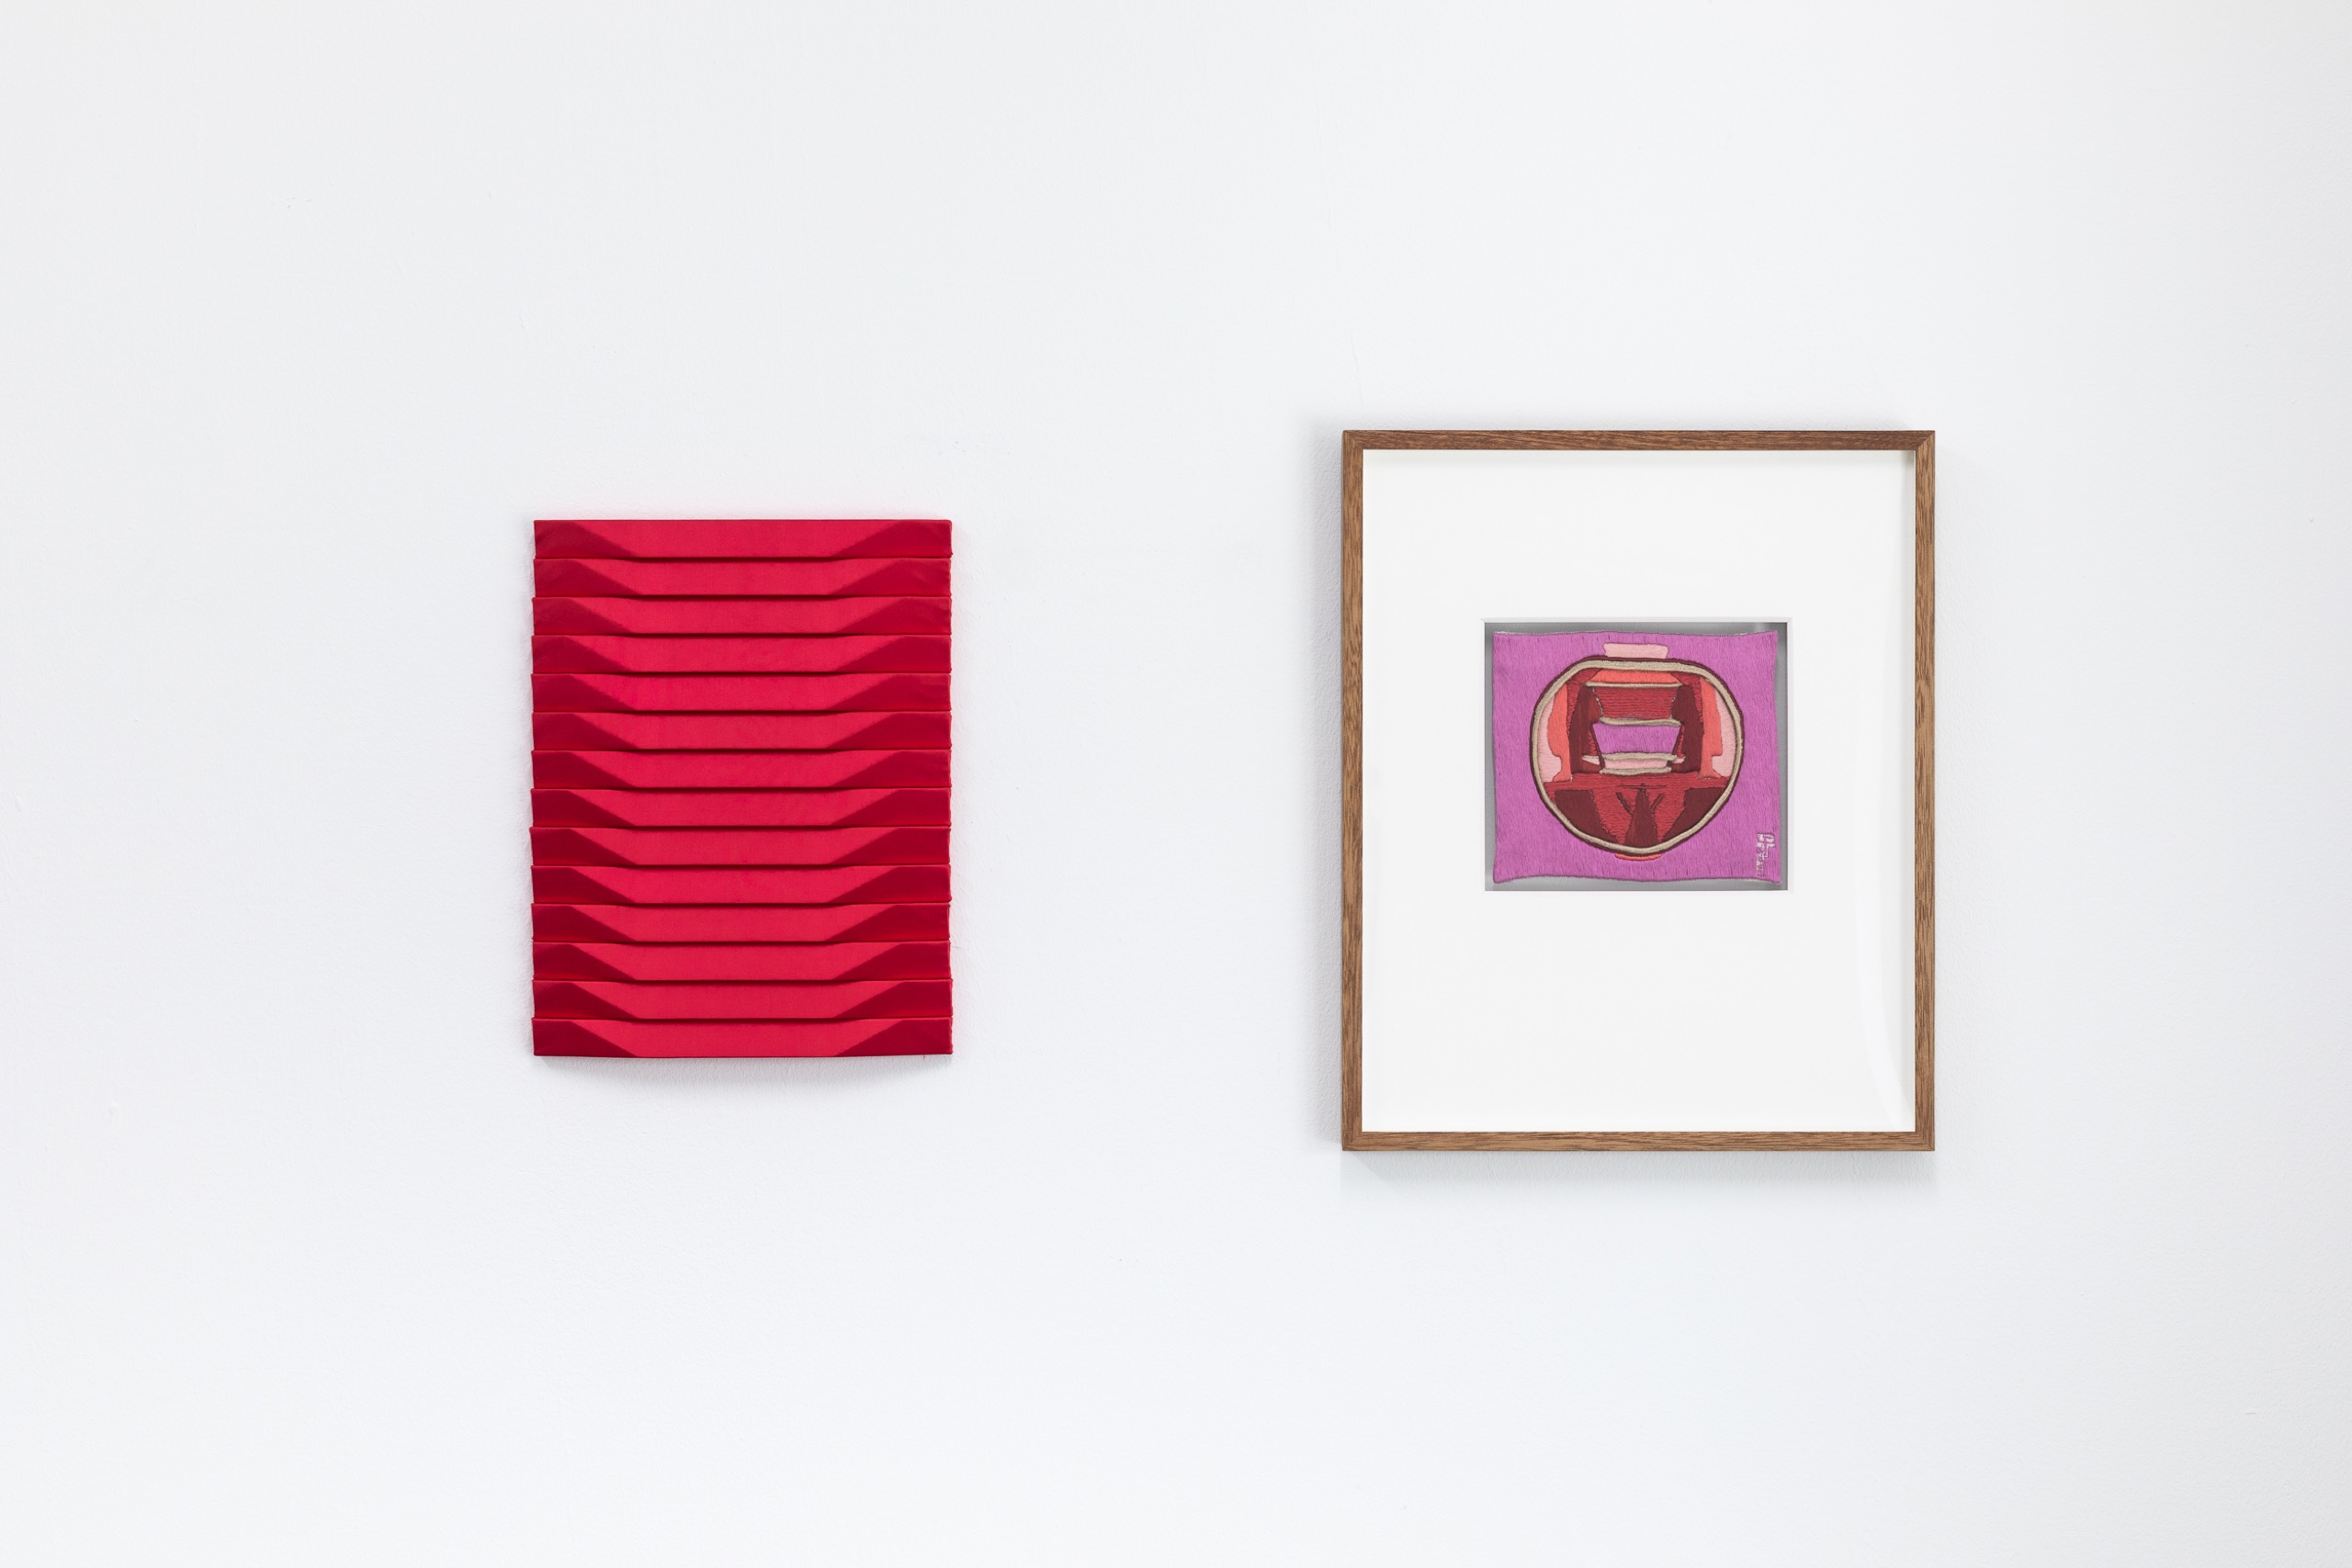 Roman Gysin, Satinbild [Satin Image] (Red), 2021, fabric, wood. Lissy Funk, Der Weg zu Dir [The path to you], 2002, hand embroidery